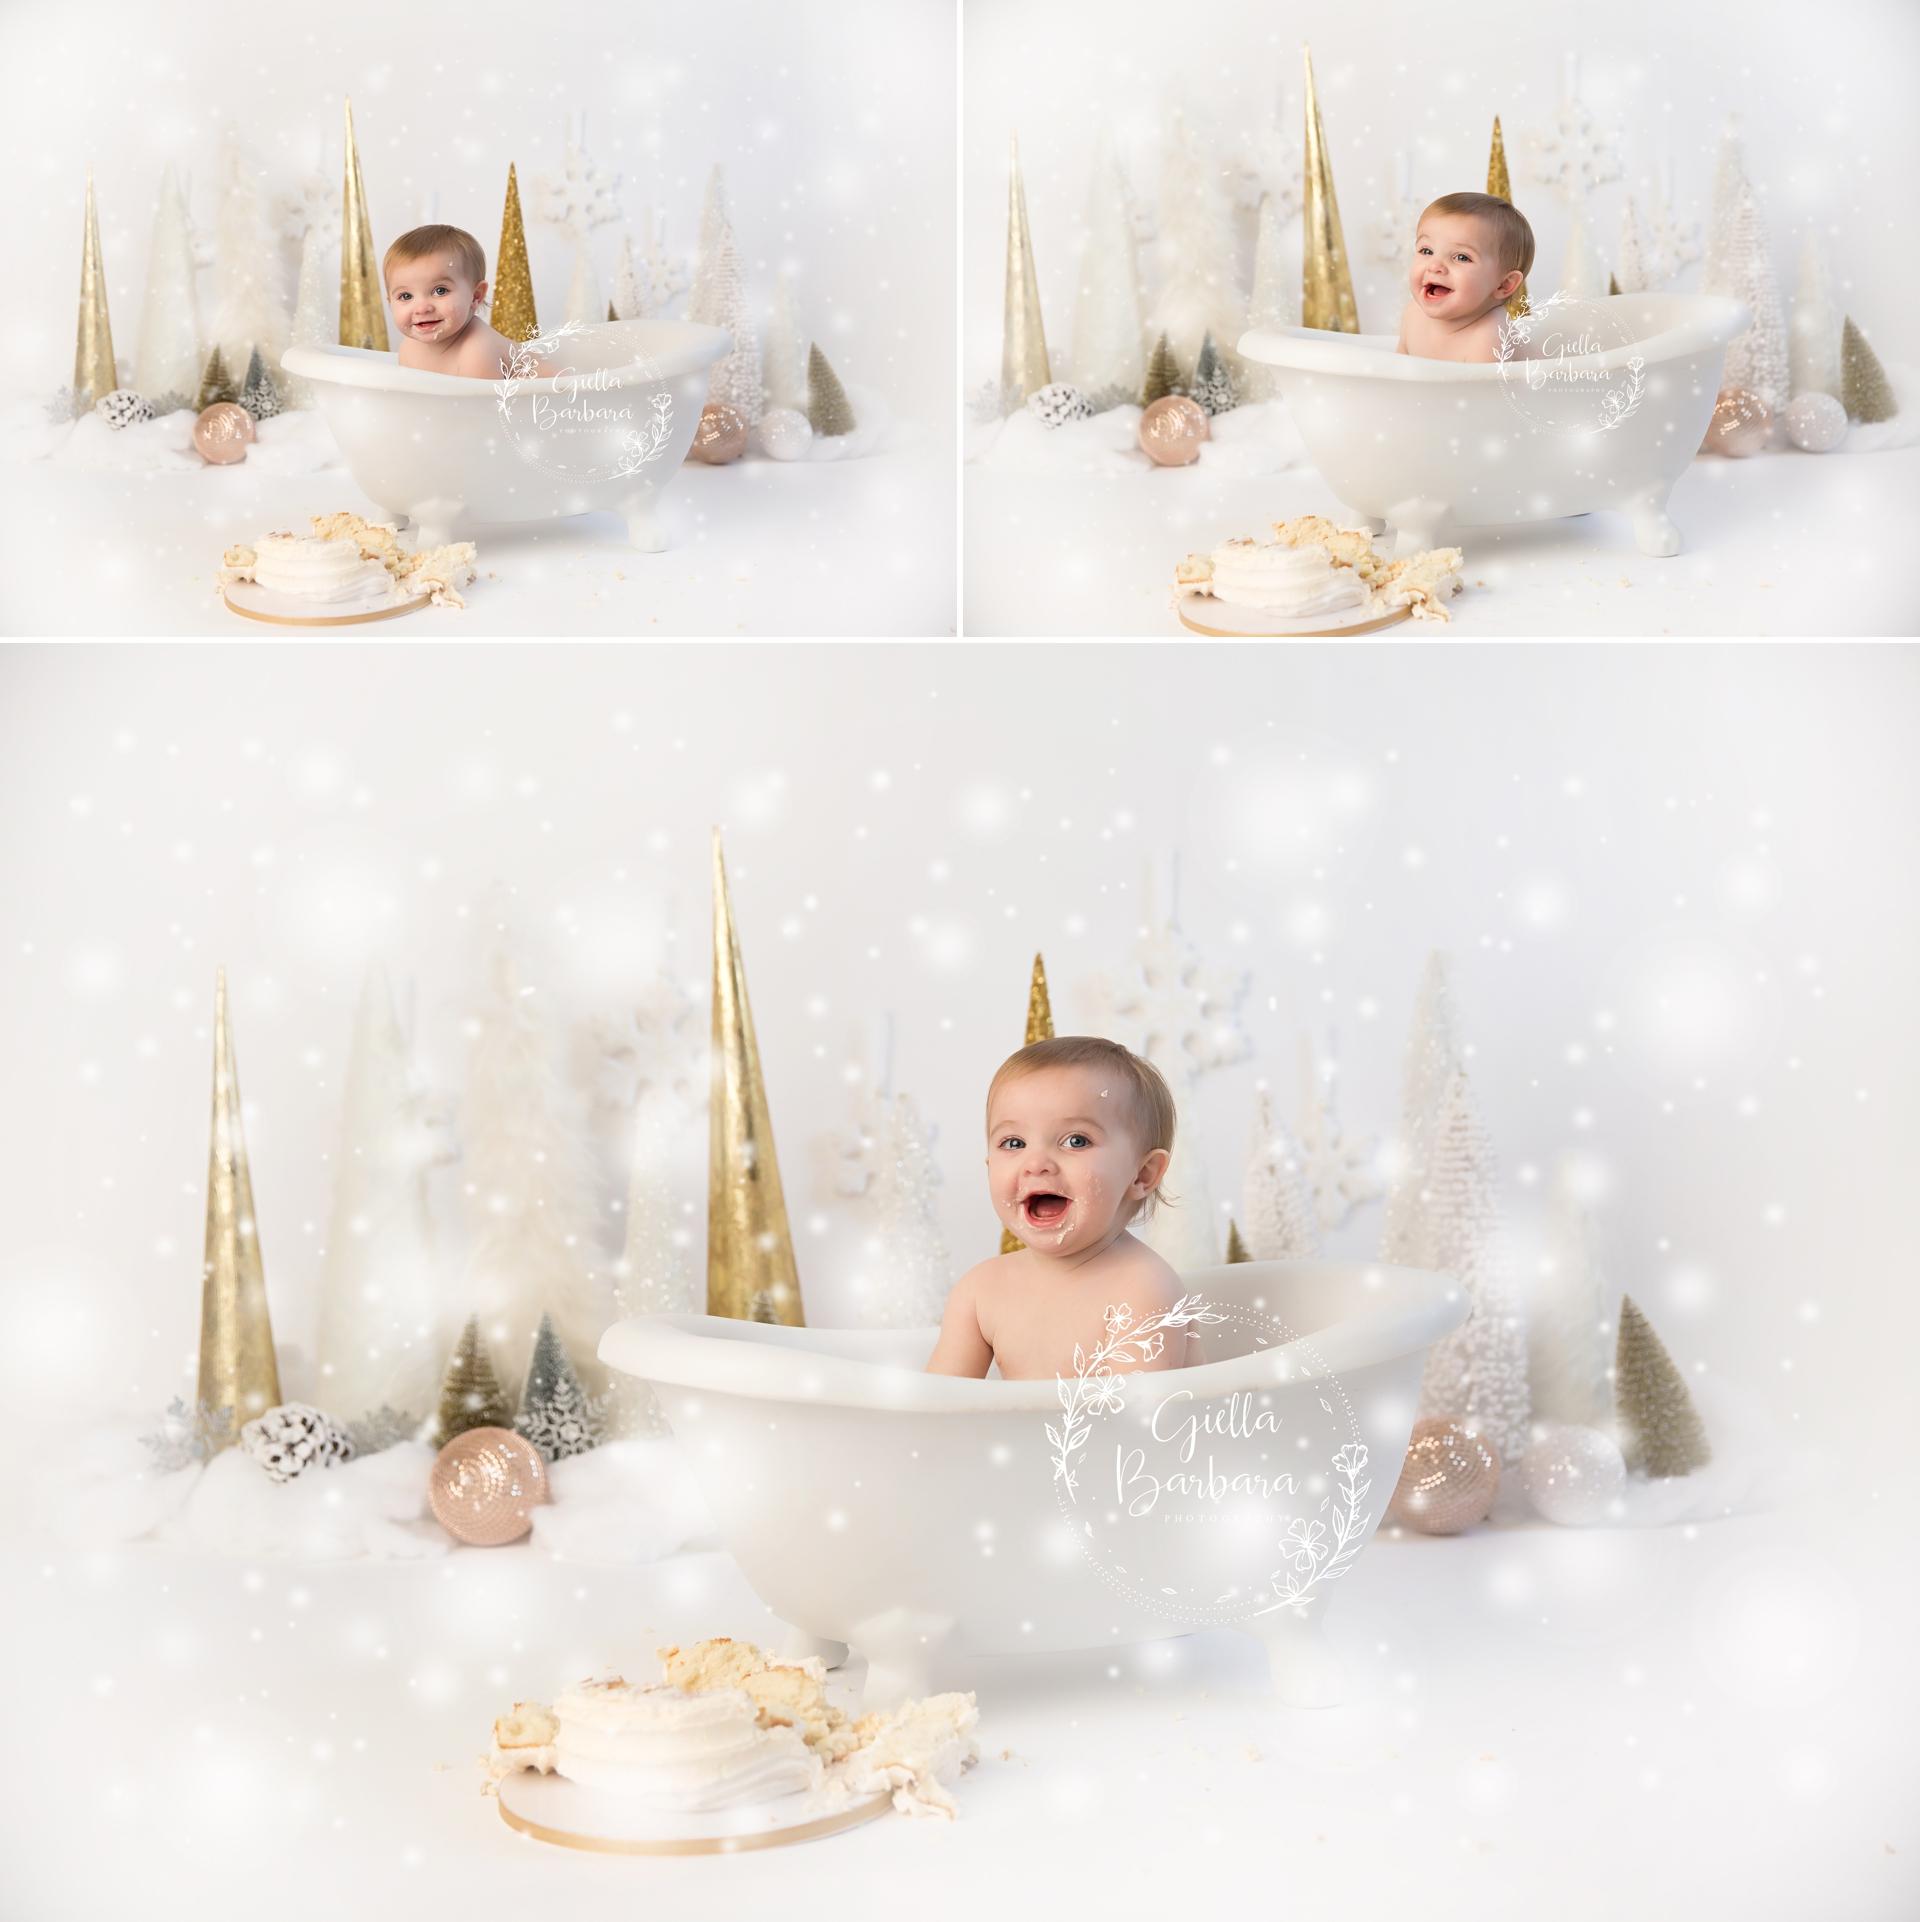 Twinkly bath time